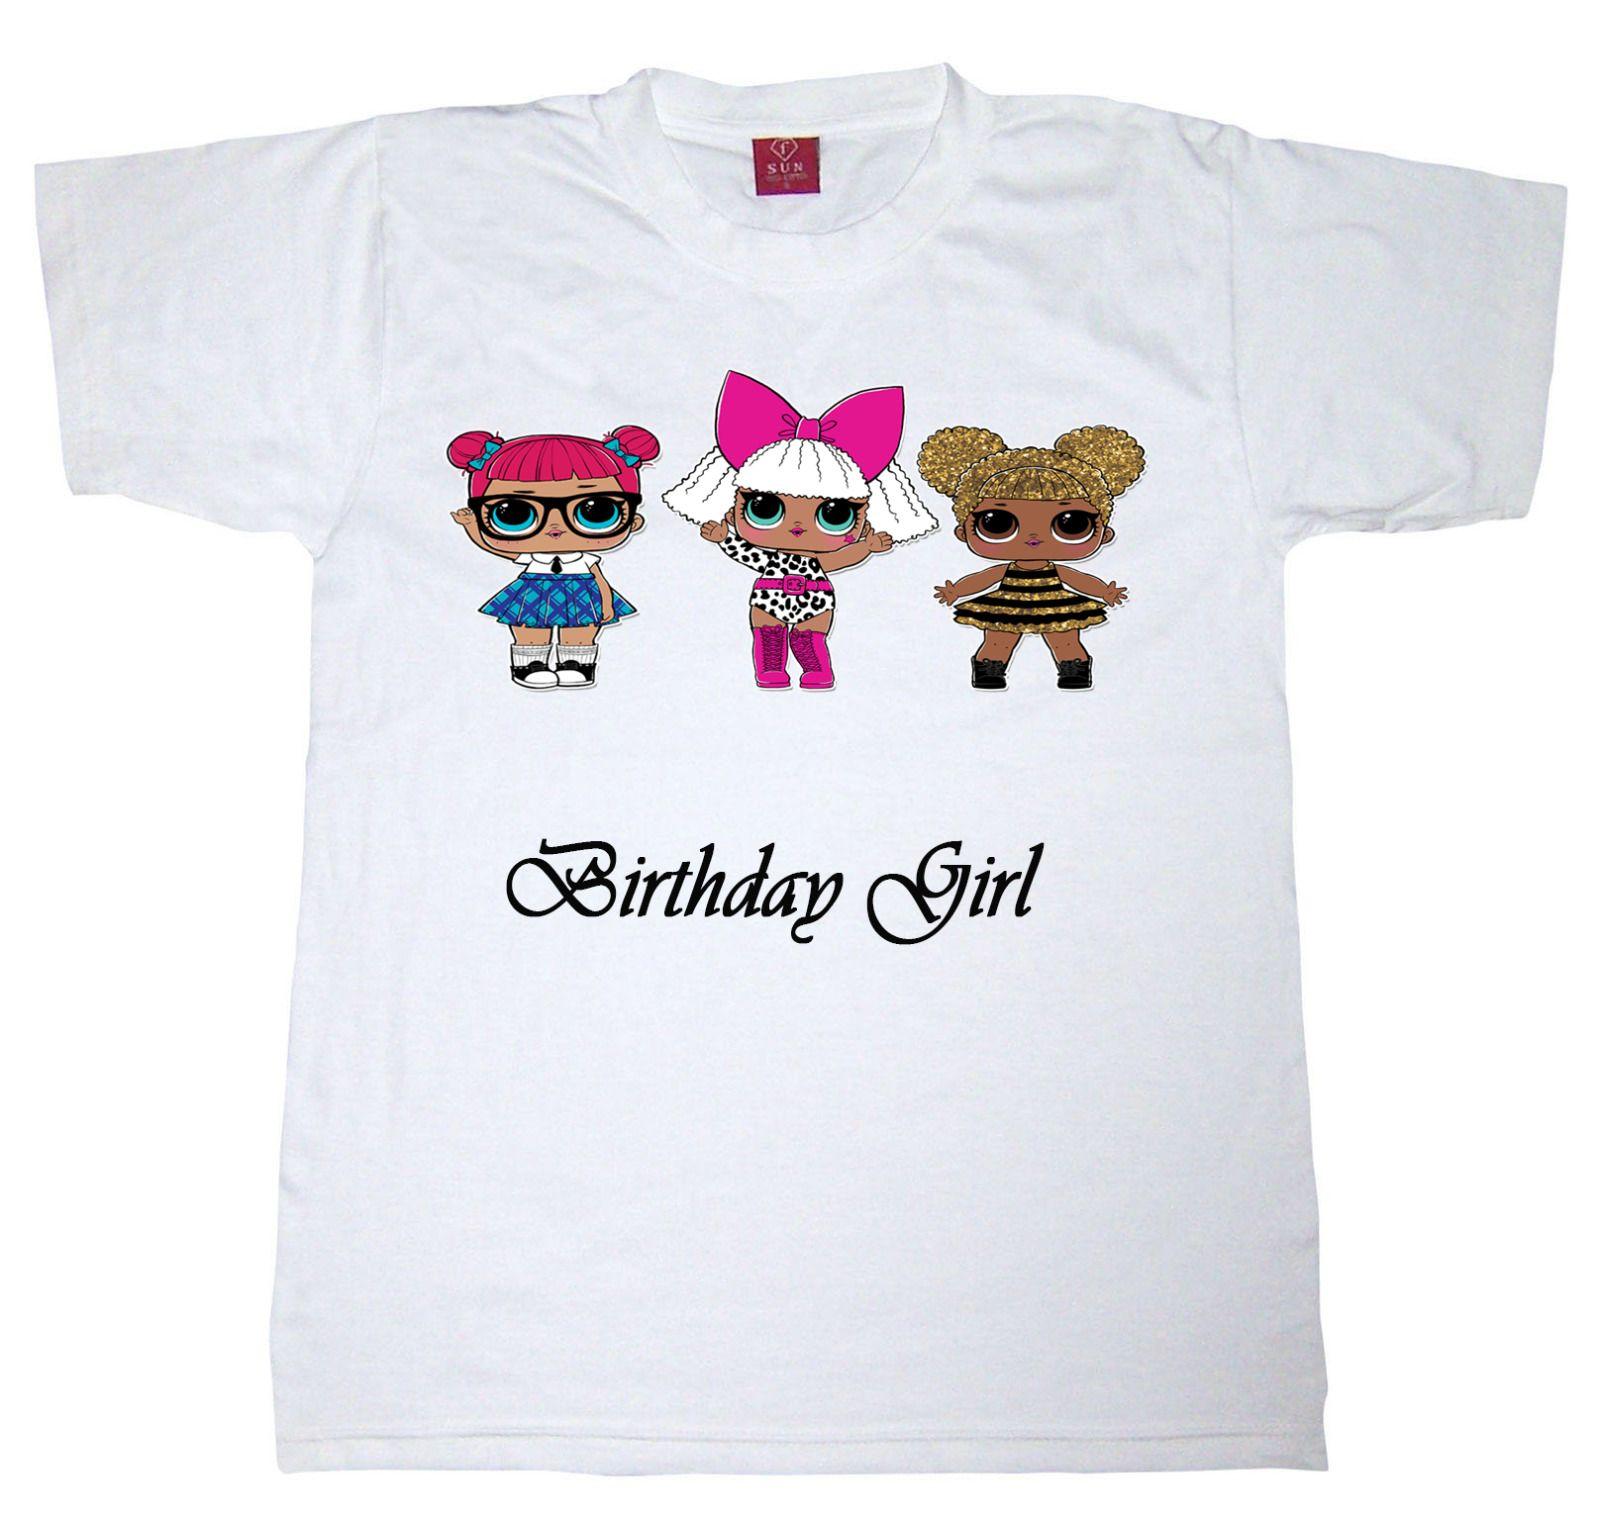 999 gbp girls lol doll personalised tshirt ebay